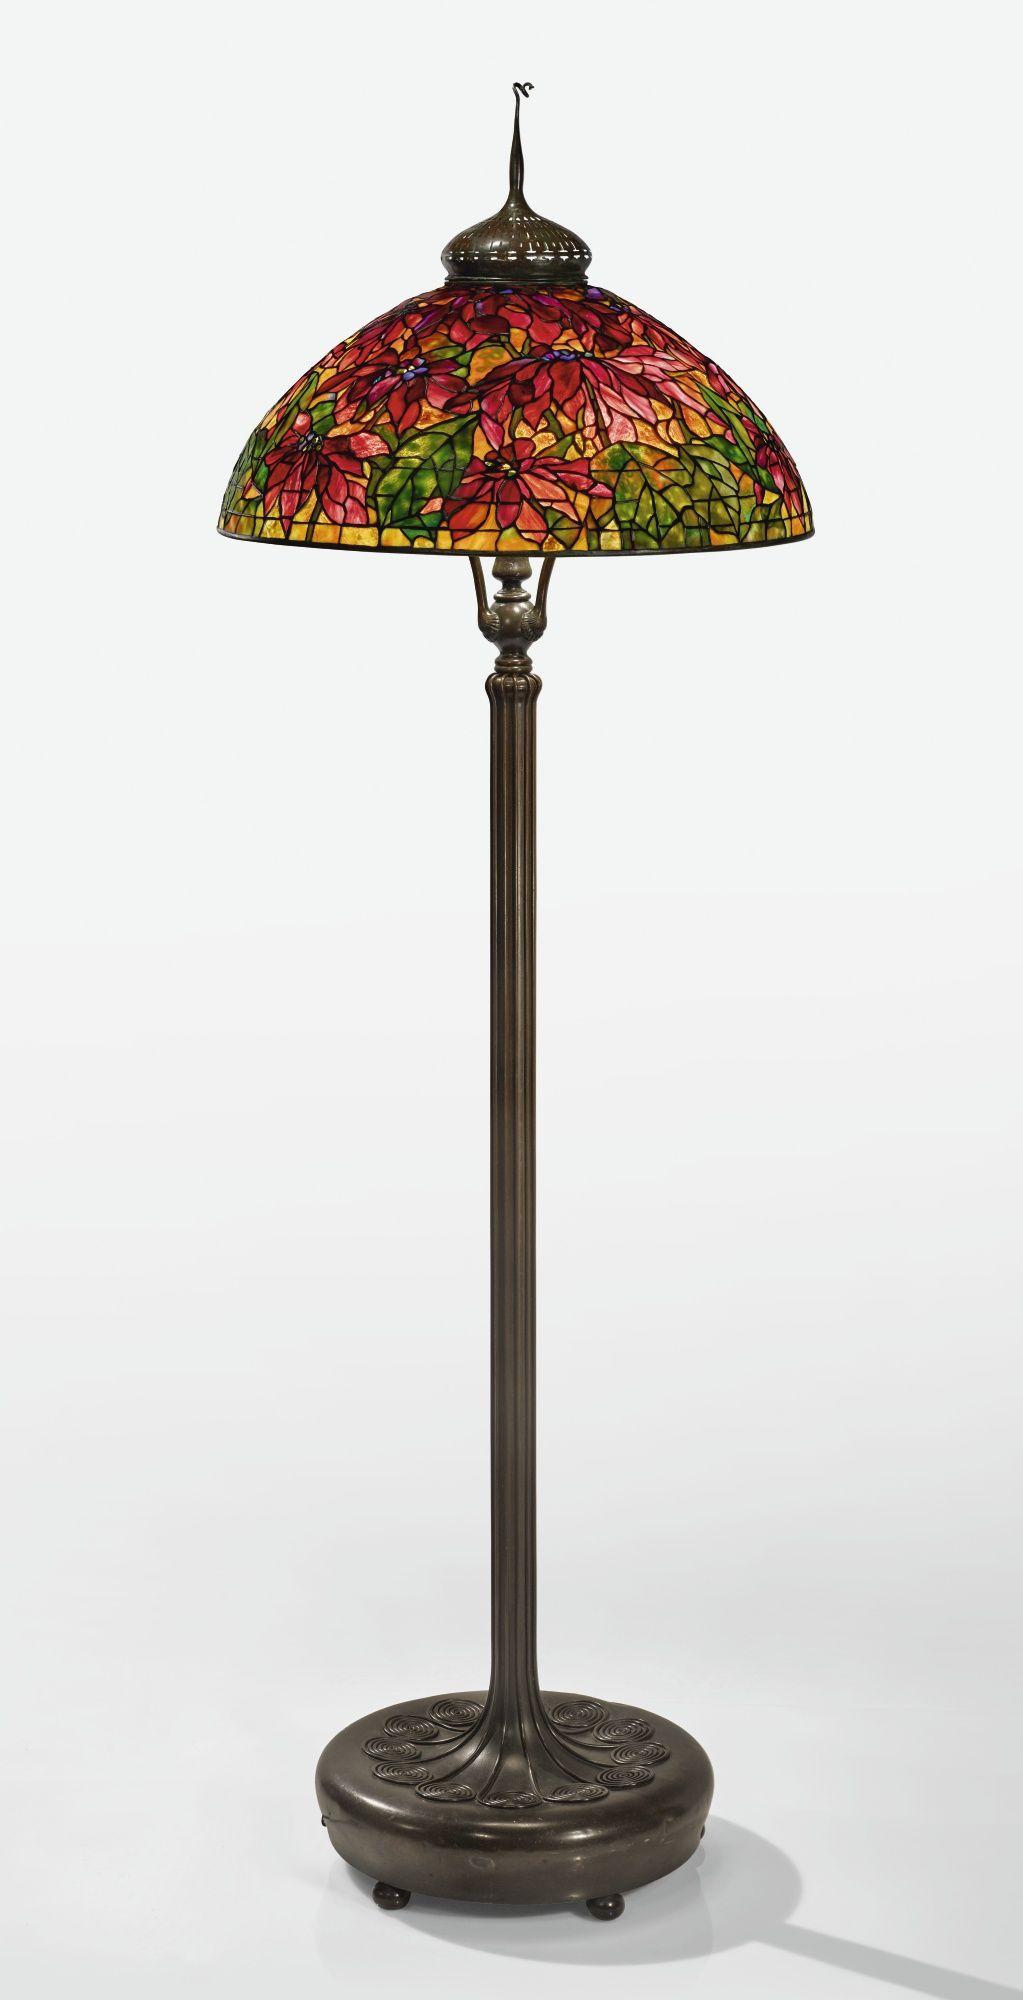 Tiffany Studios A Rare Poinset Lighting Sotheby S